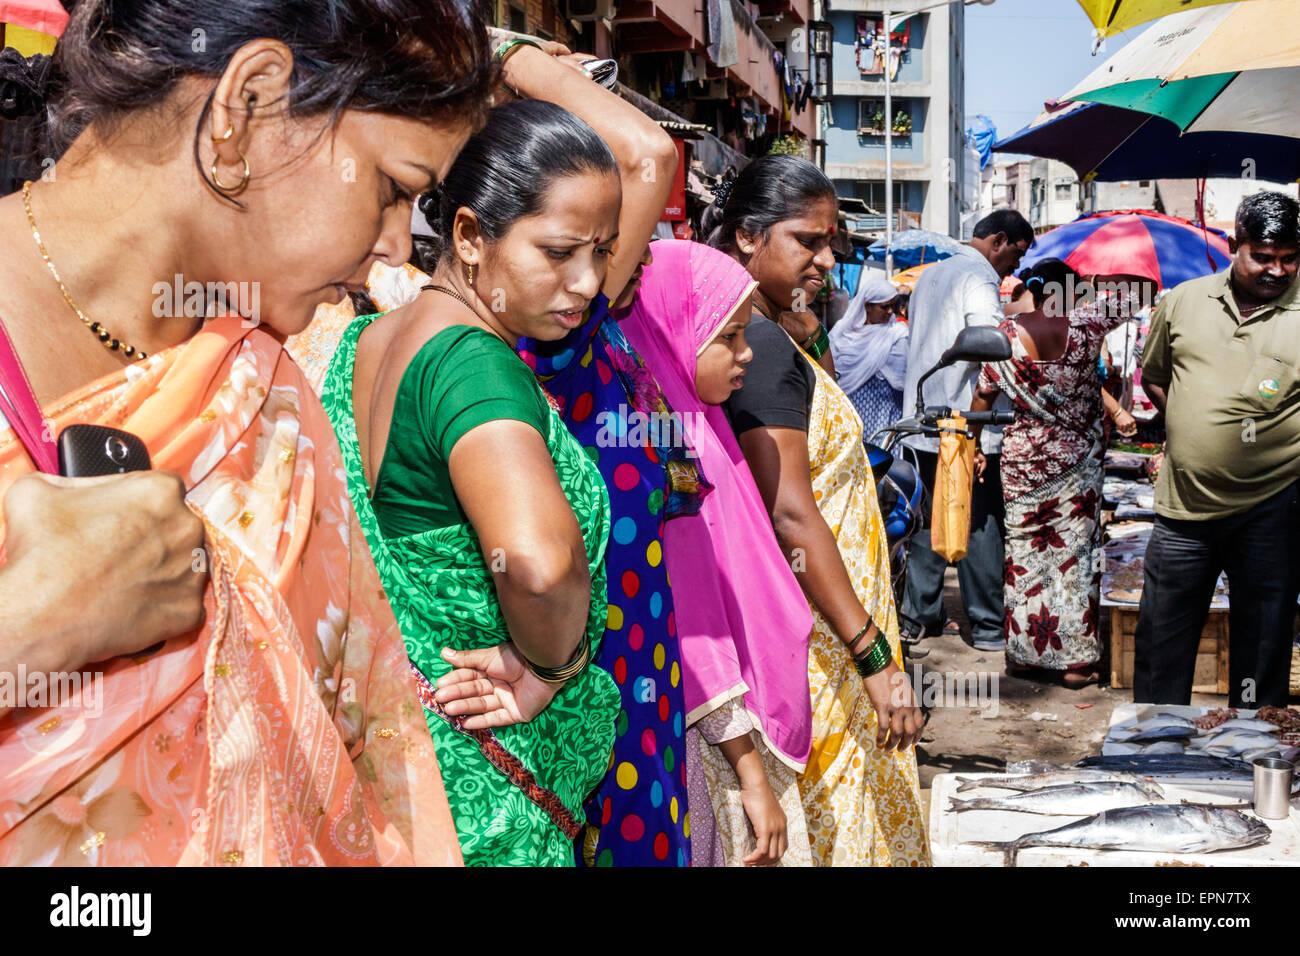 Mumbai India Asian Apollo Bandar Colaba Causeway Market Lala Nigam Road shopping street vendors stalls sale display - Stock Image